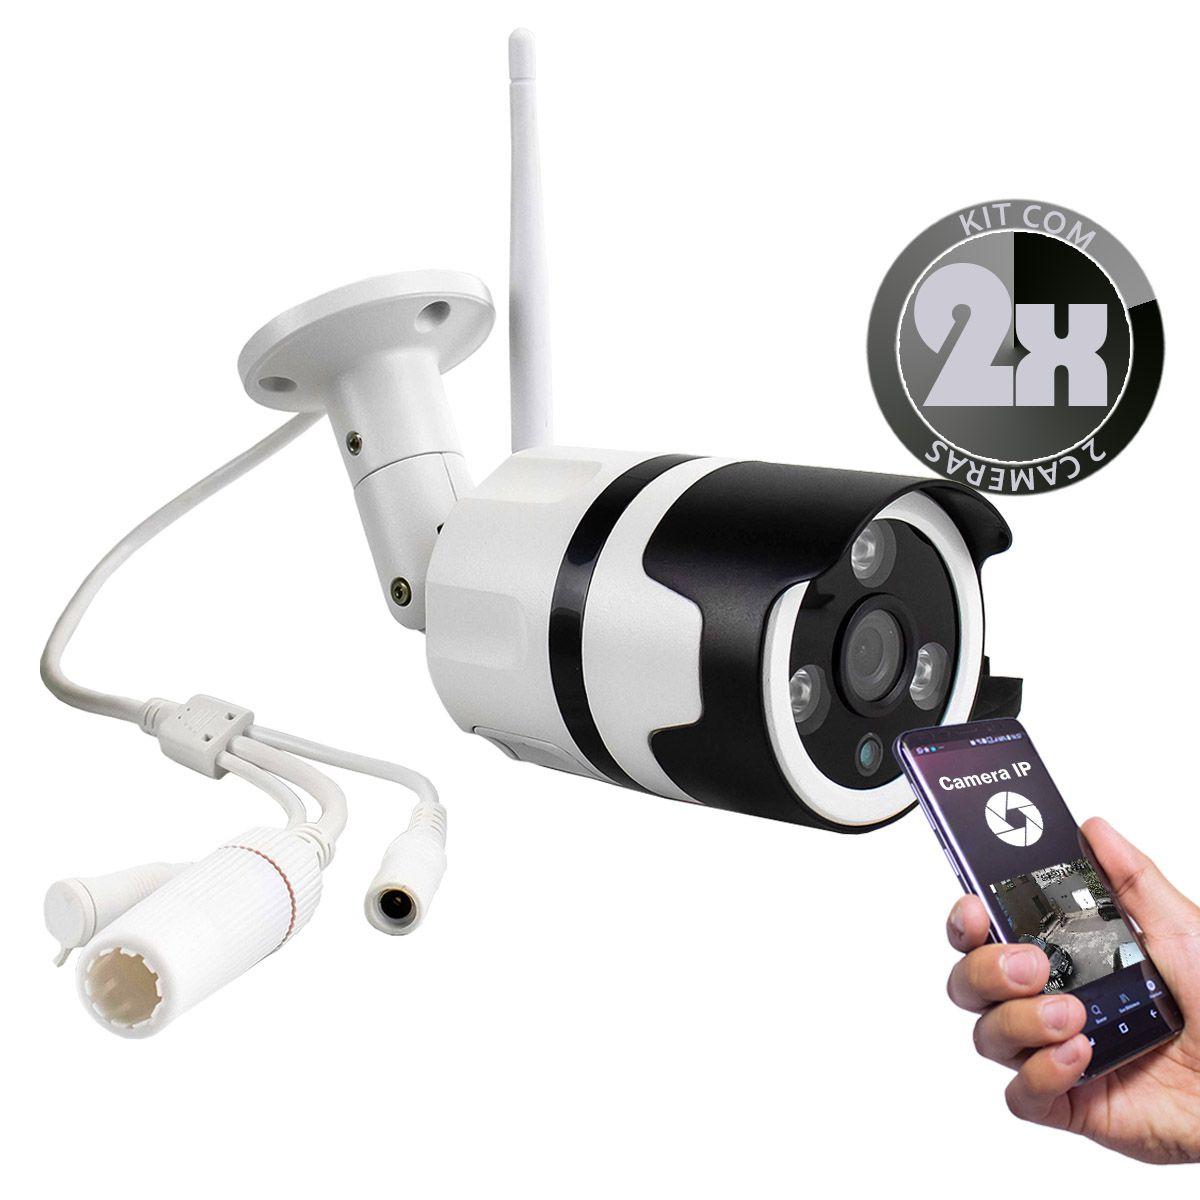 KIT 2x Câmera IP Digital Externa HD à Prova D'água com Visão Noturna 1920x1080 1.8MP-1F 3.6mm Lente XA-N632